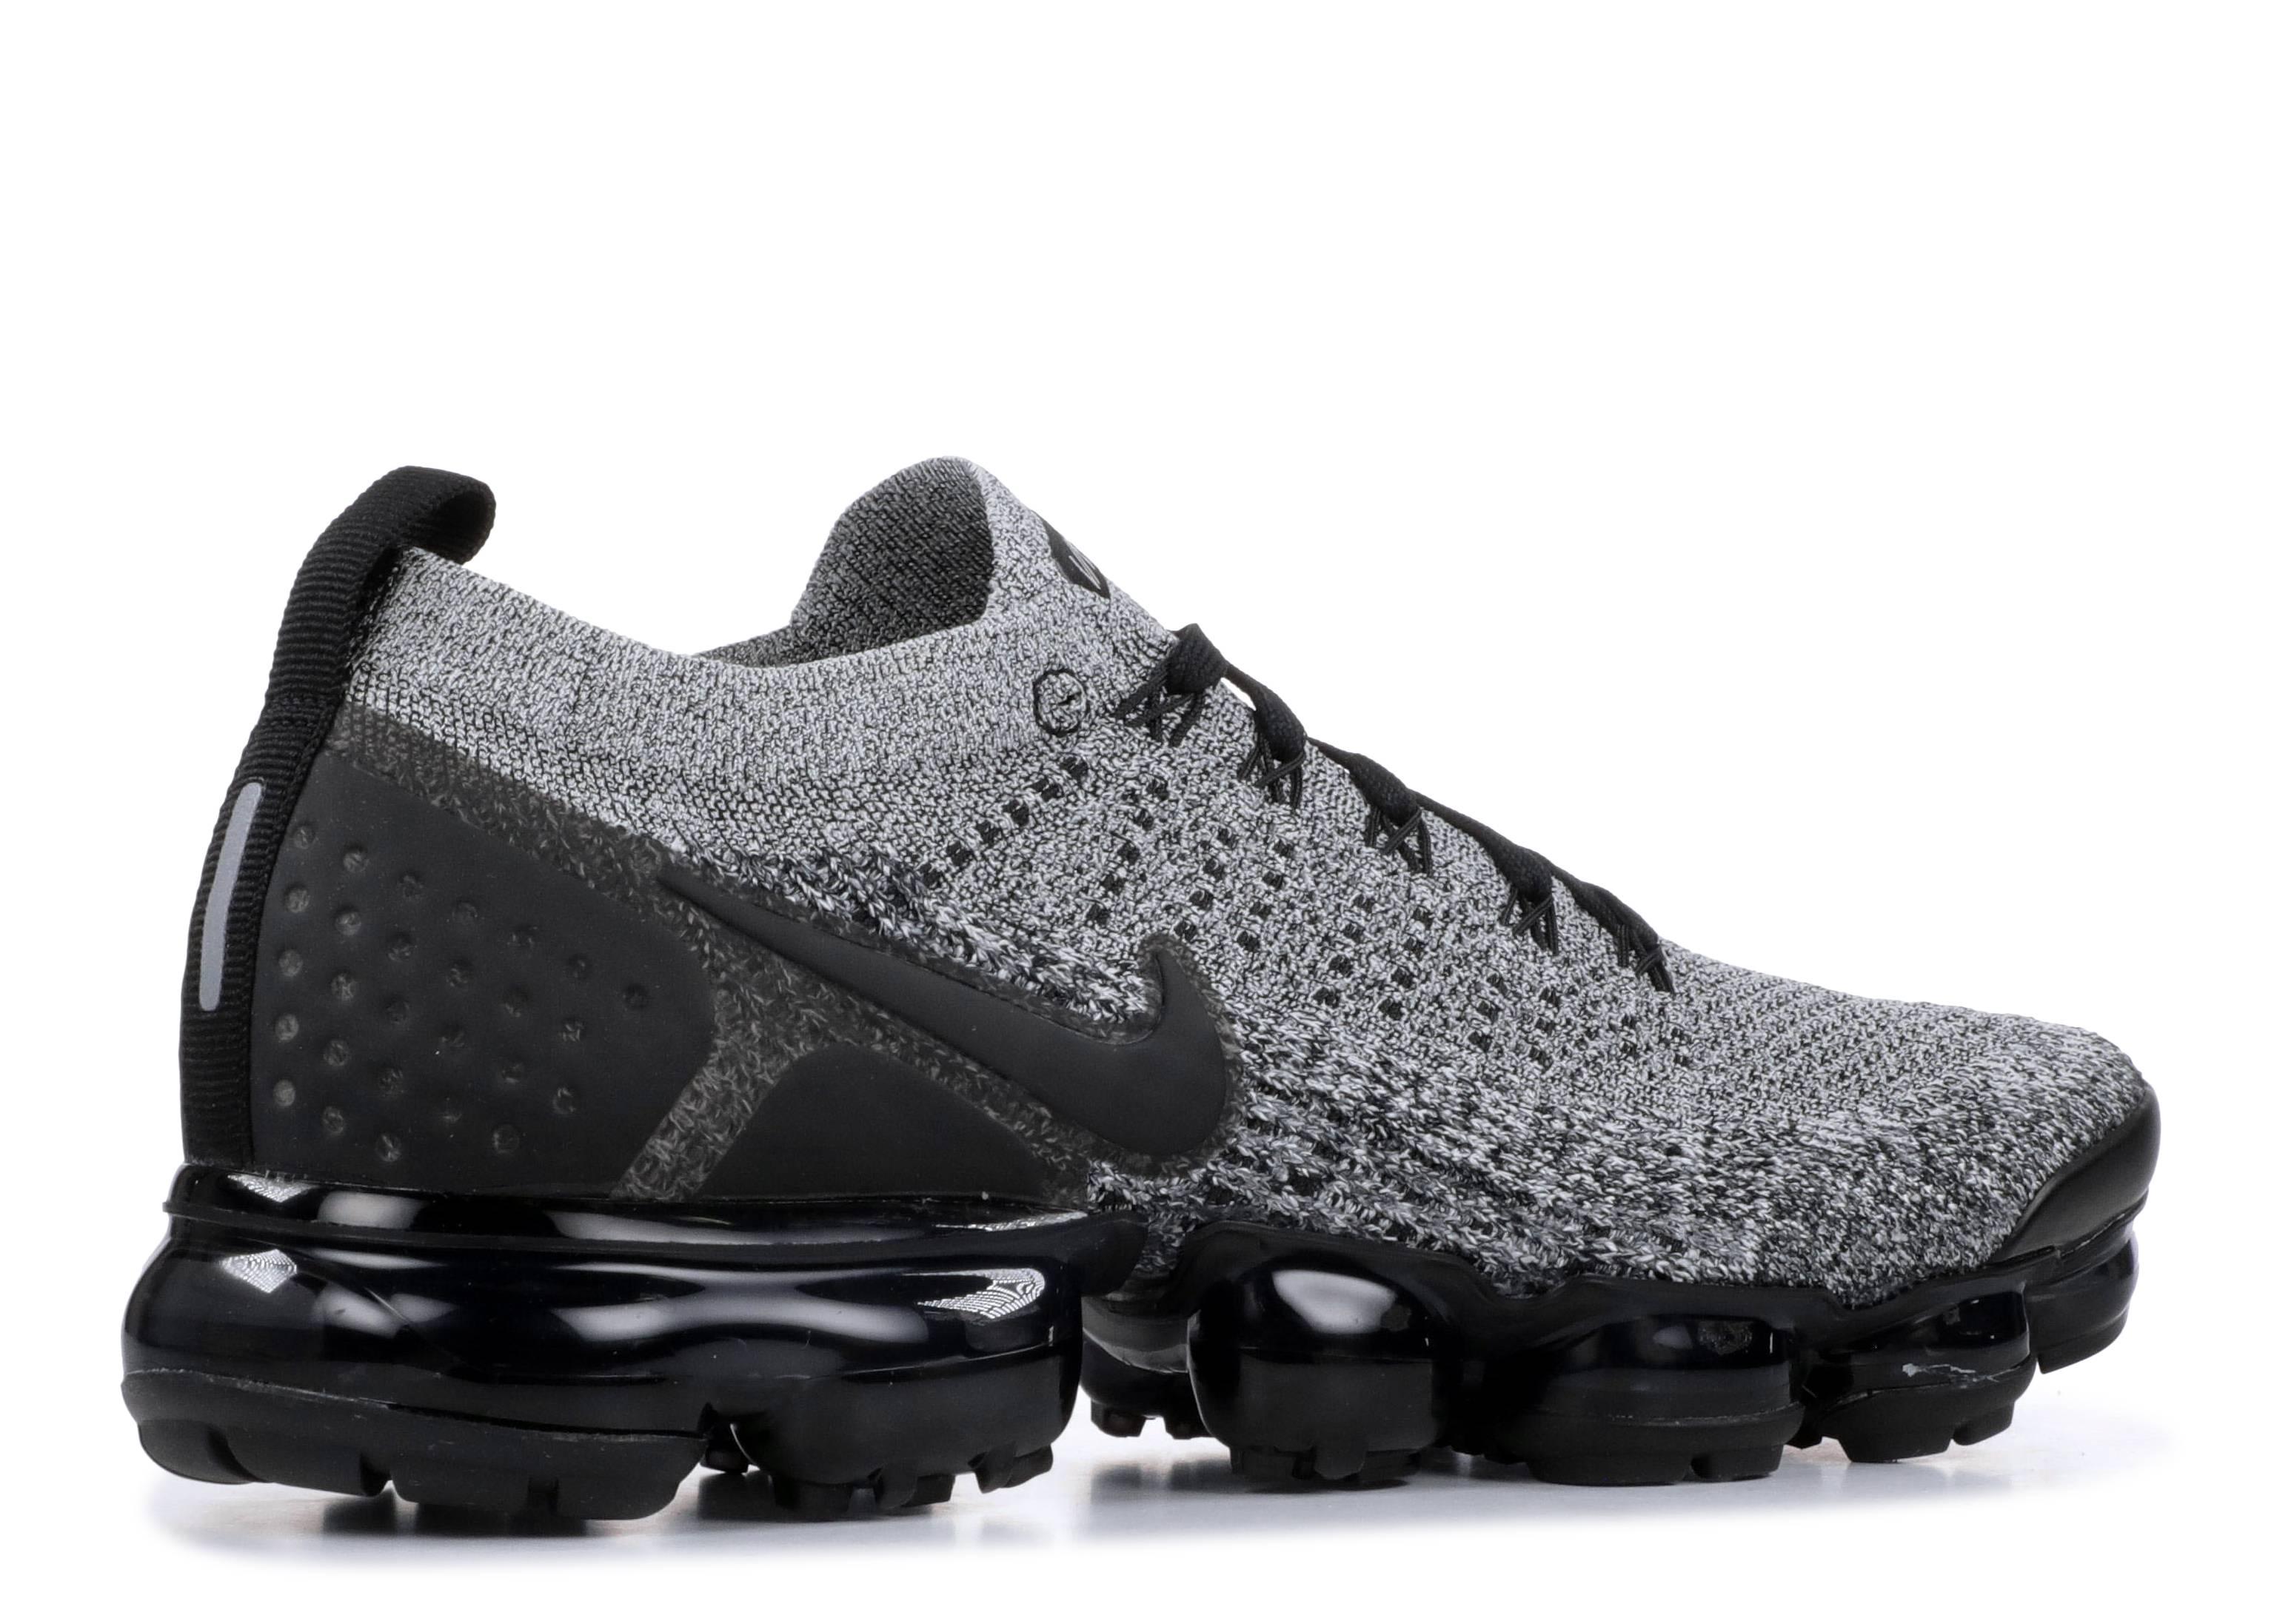 Nike Air Vapormax Flyknit 2 - Nike - 942842 107 - white black-black ... 866316c52